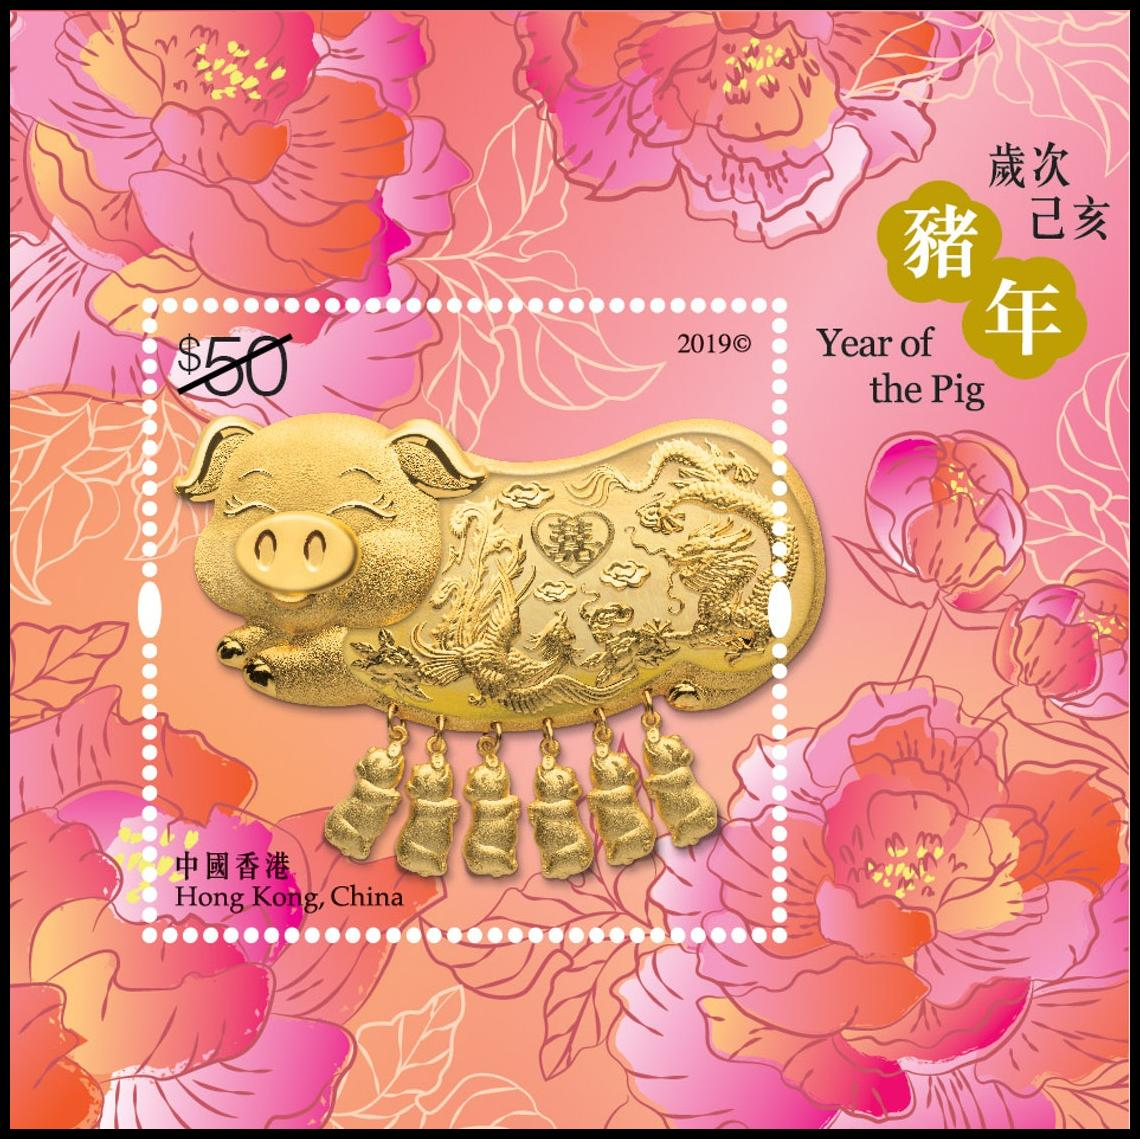 Hong Kong - Year of the Pig (January 12, 2019) silk souvenir sheet